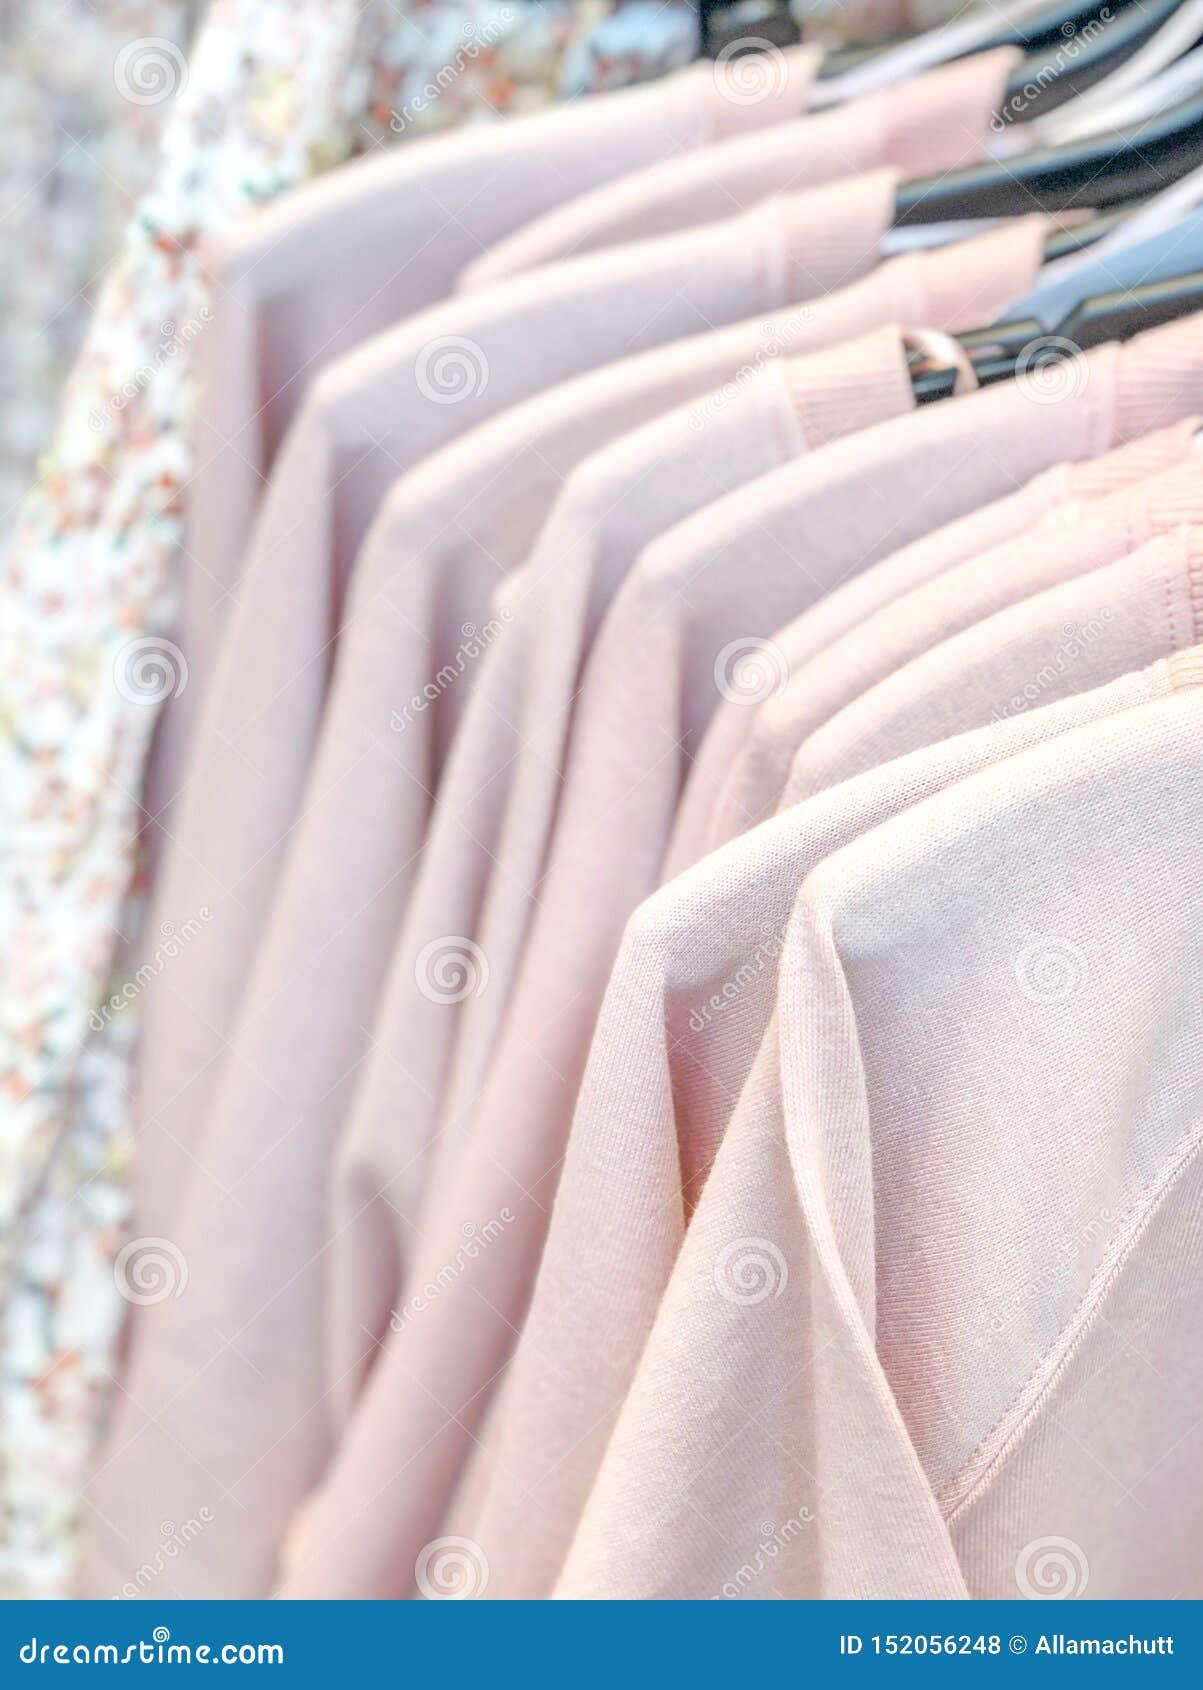 Rail of t-shirts